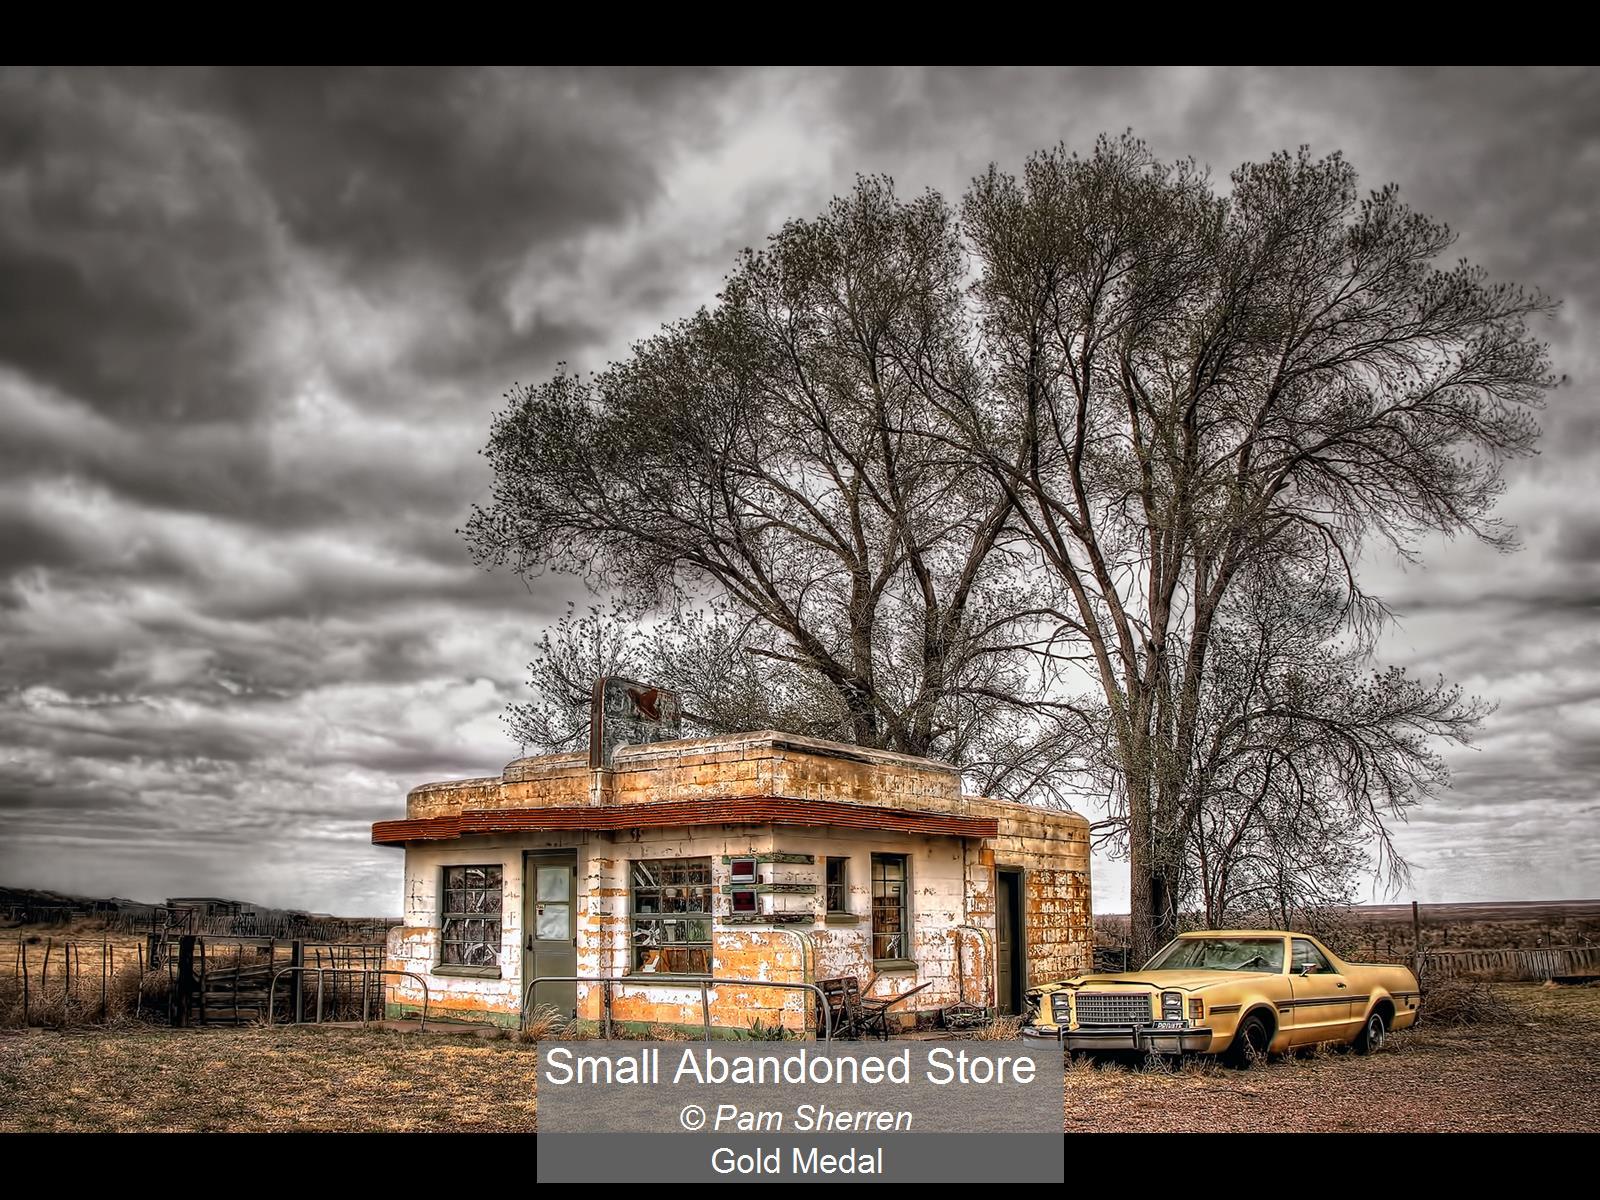 Small Abandoned Store_Pam Sherren_Gold